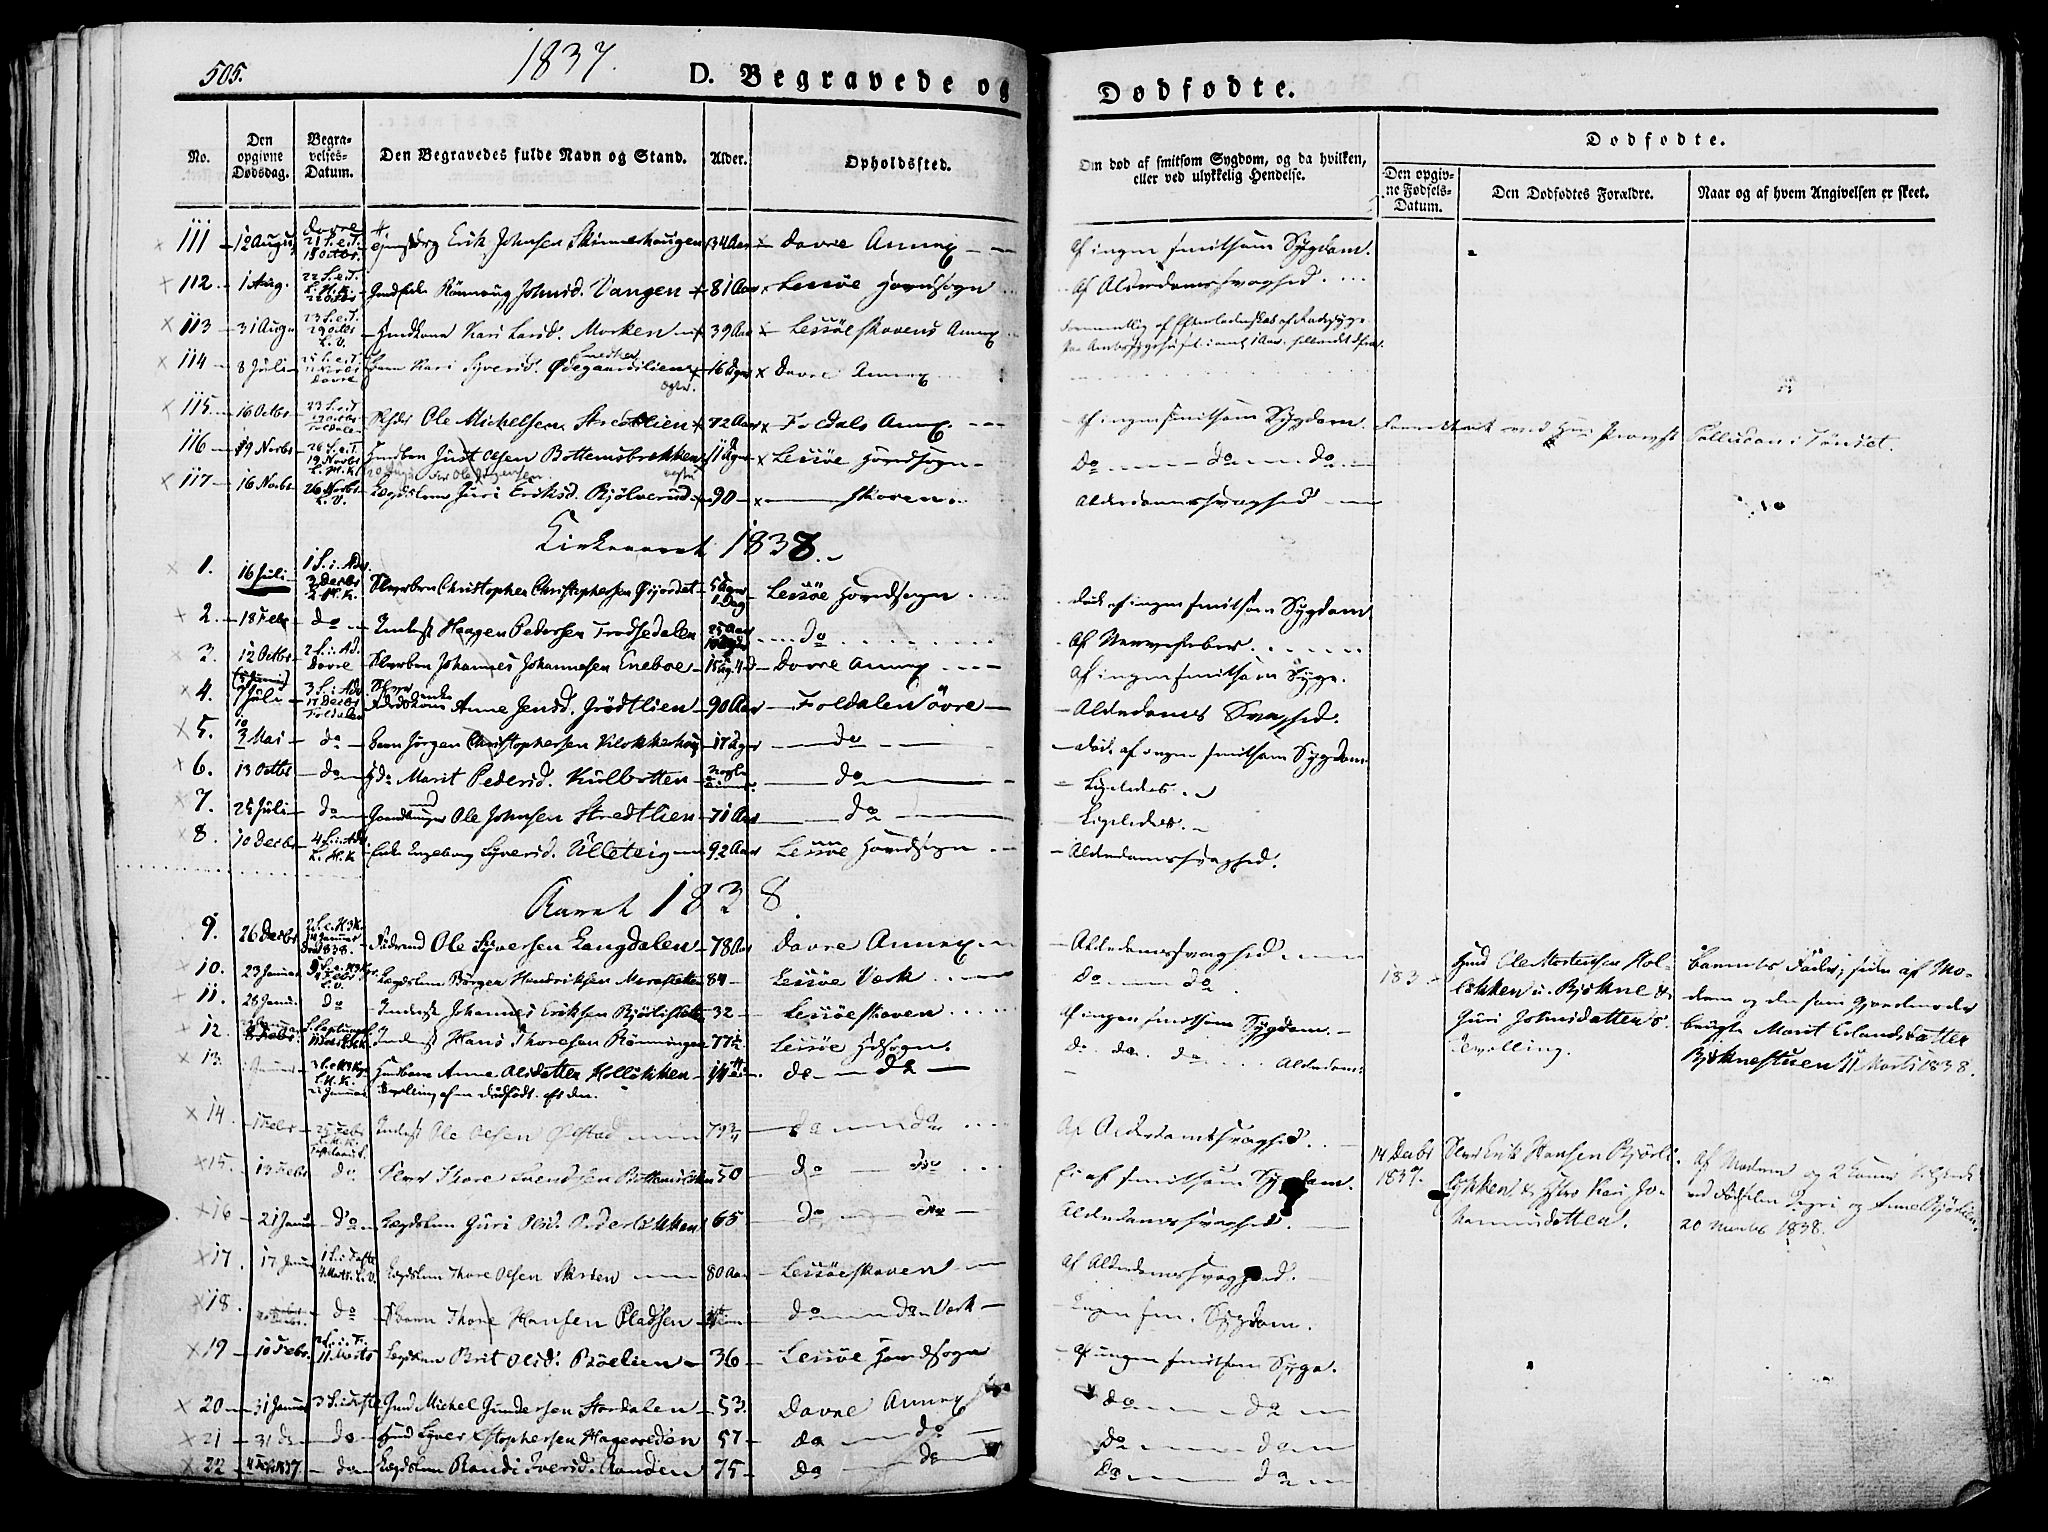 SAH, Lesja prestekontor, Ministerialbok nr. 5, 1830-1842, s. 505